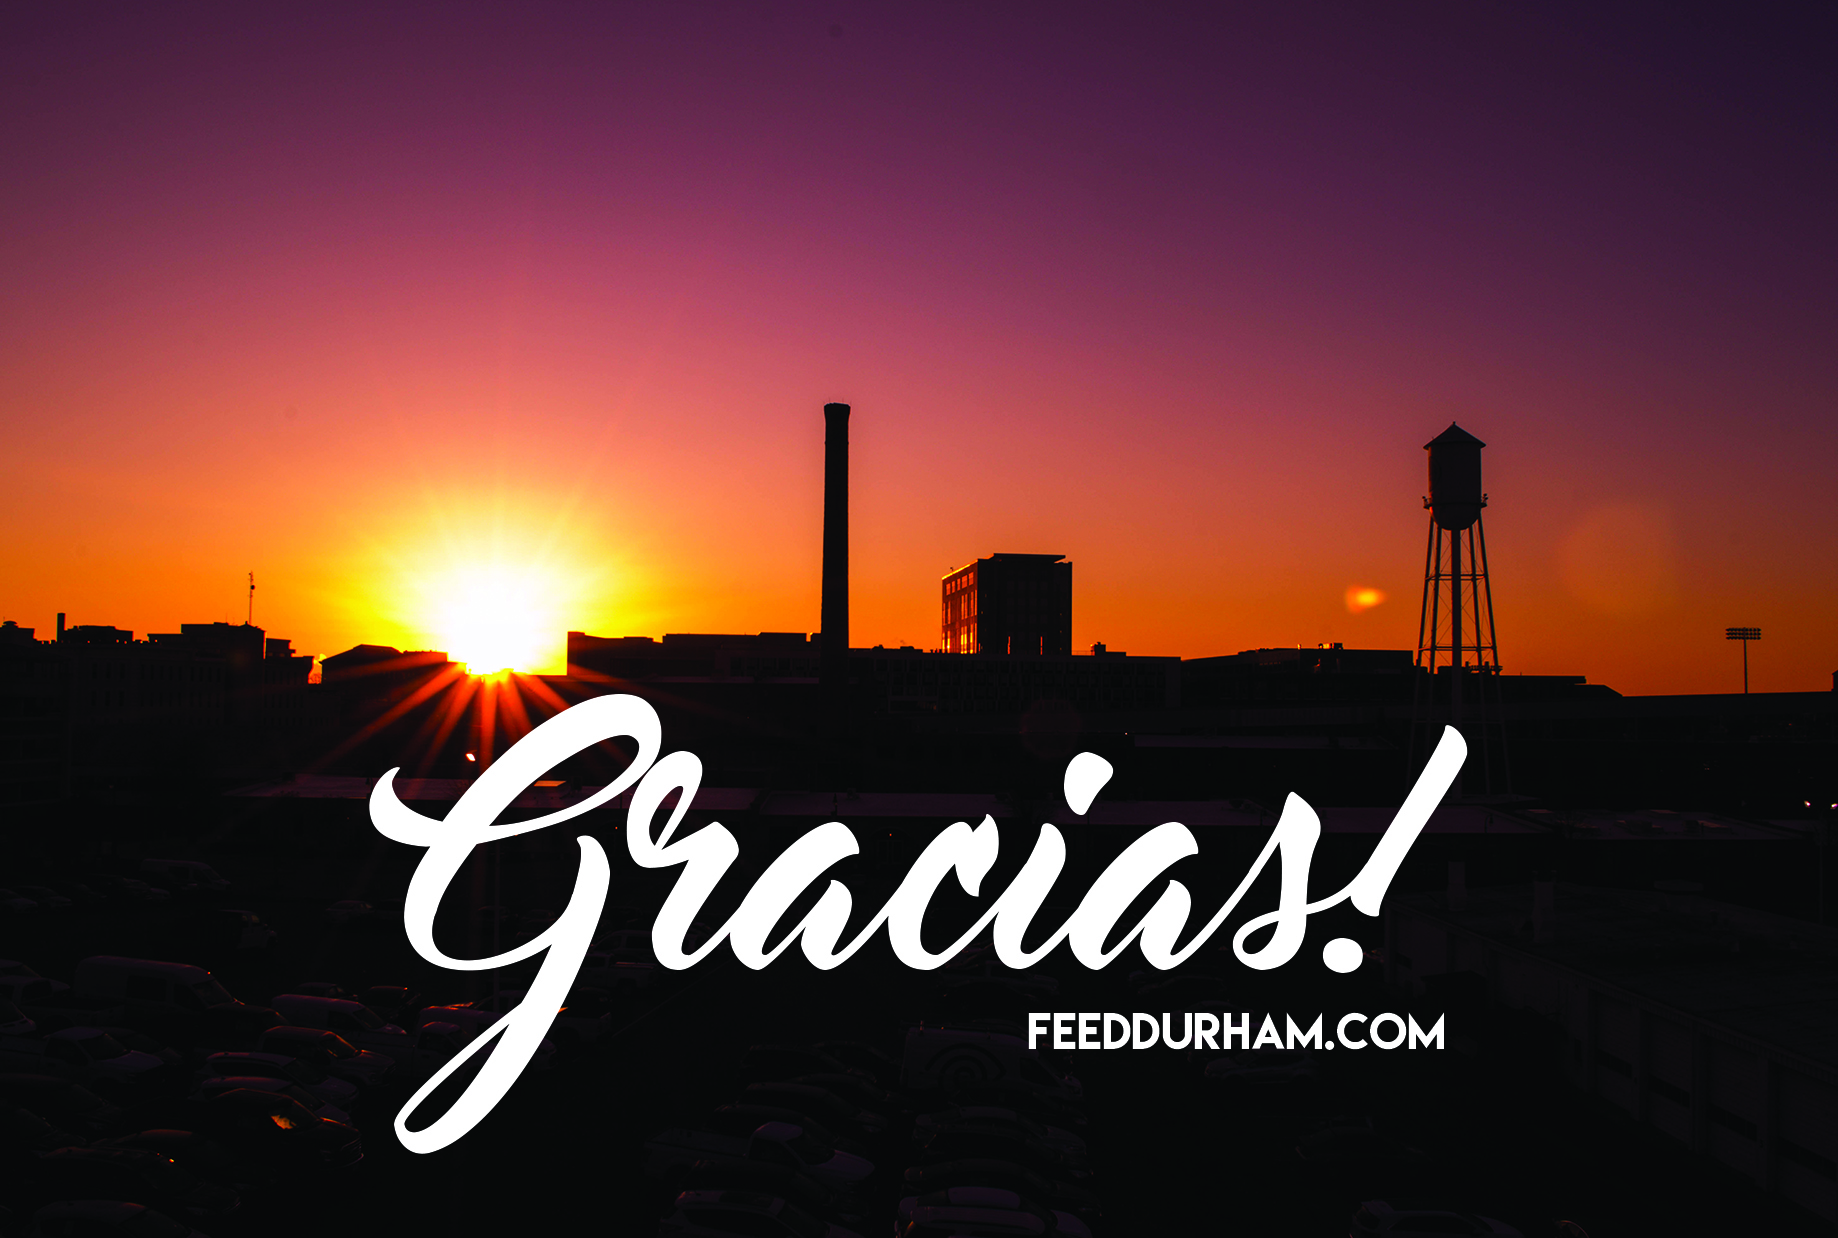 thankyou Front spanish.jpg